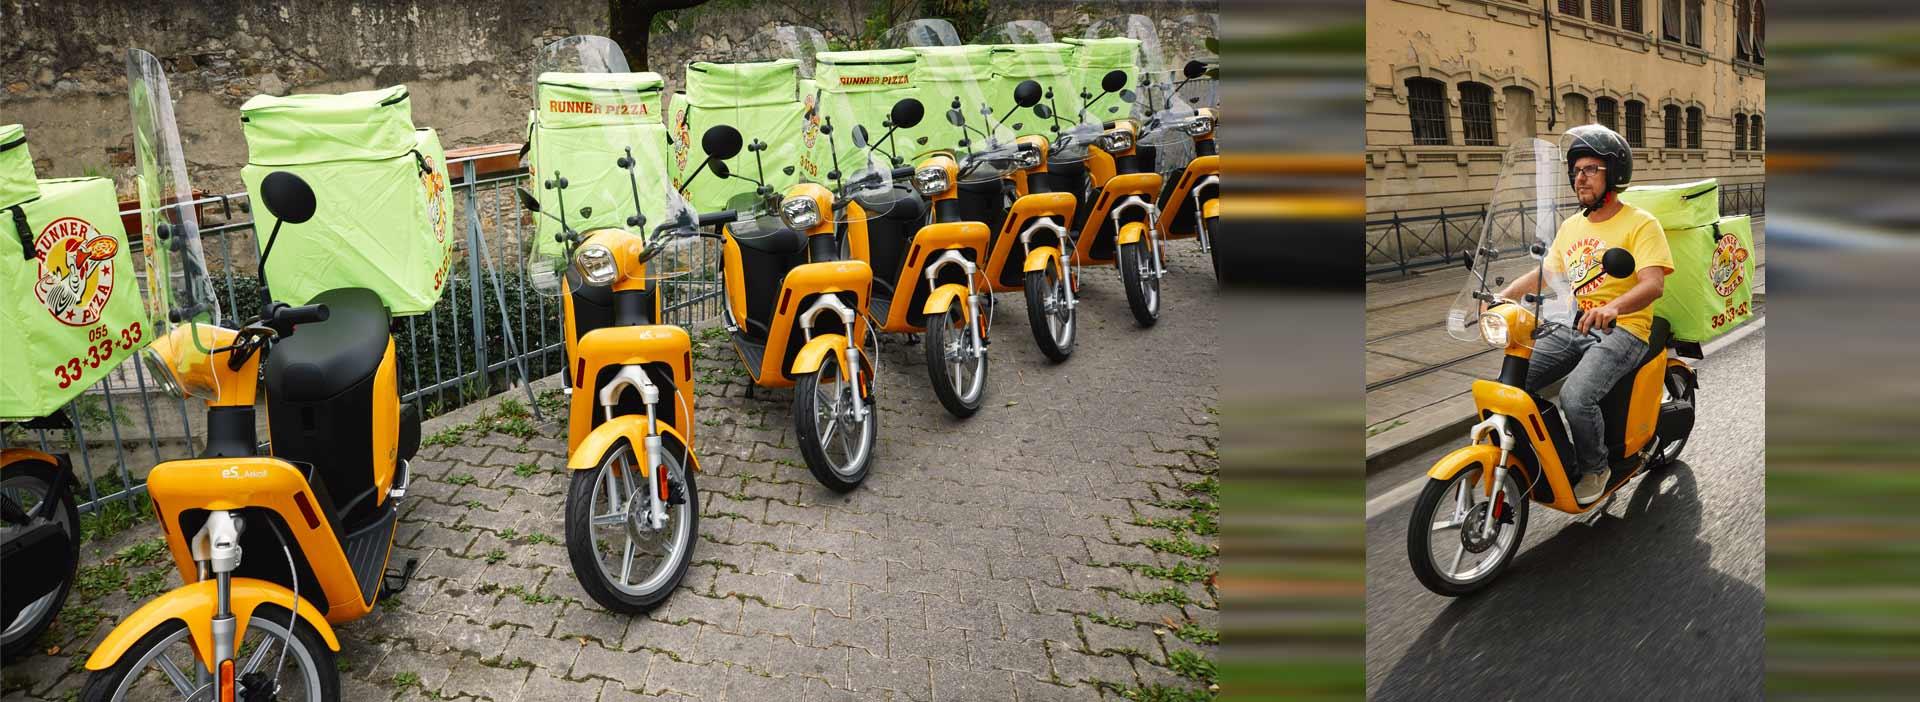 Elektroscooter Askoll eSpro Flotte